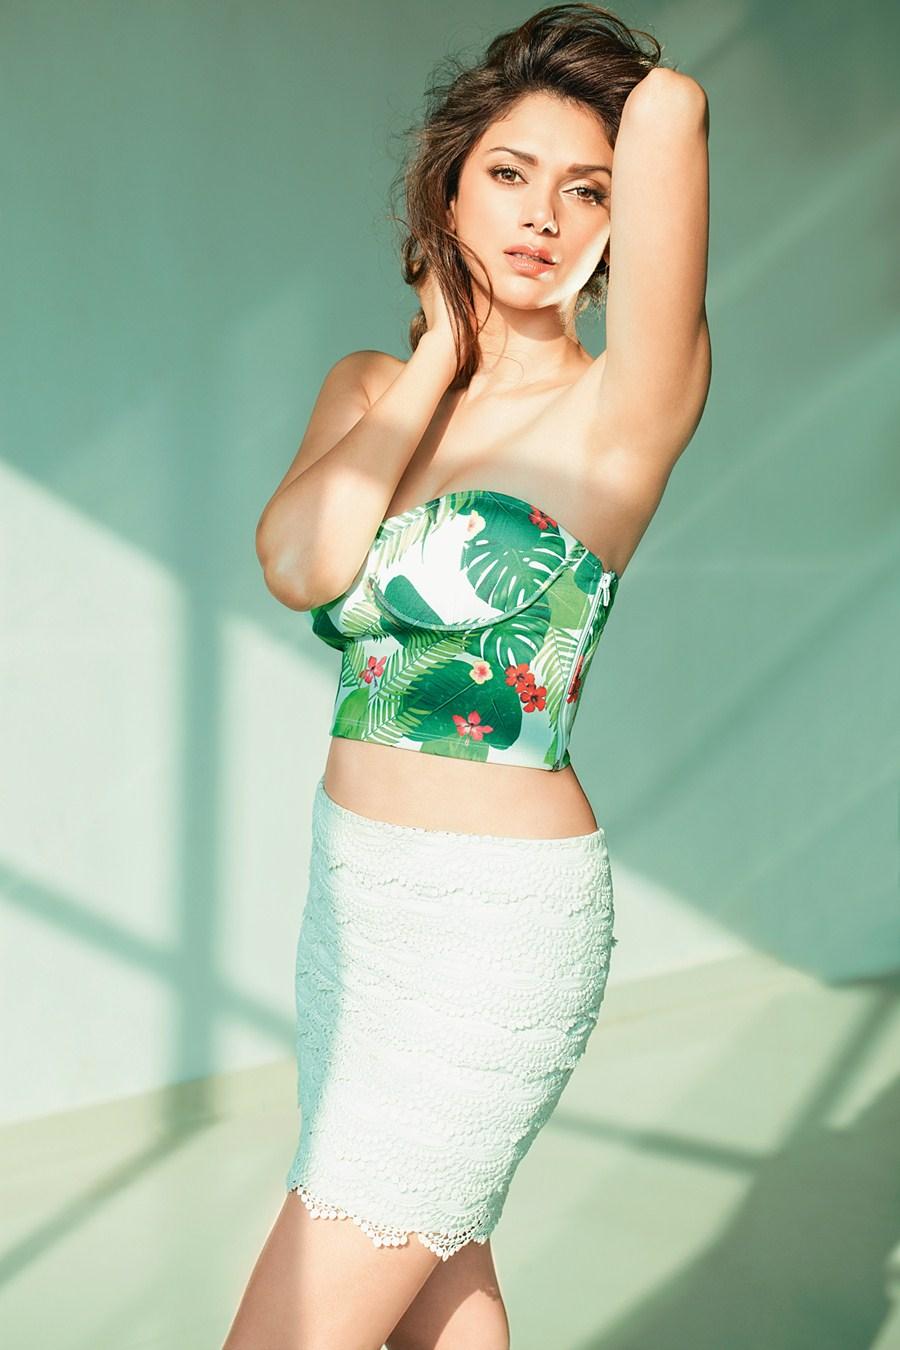 Actress Stills: White Color Modern Dress